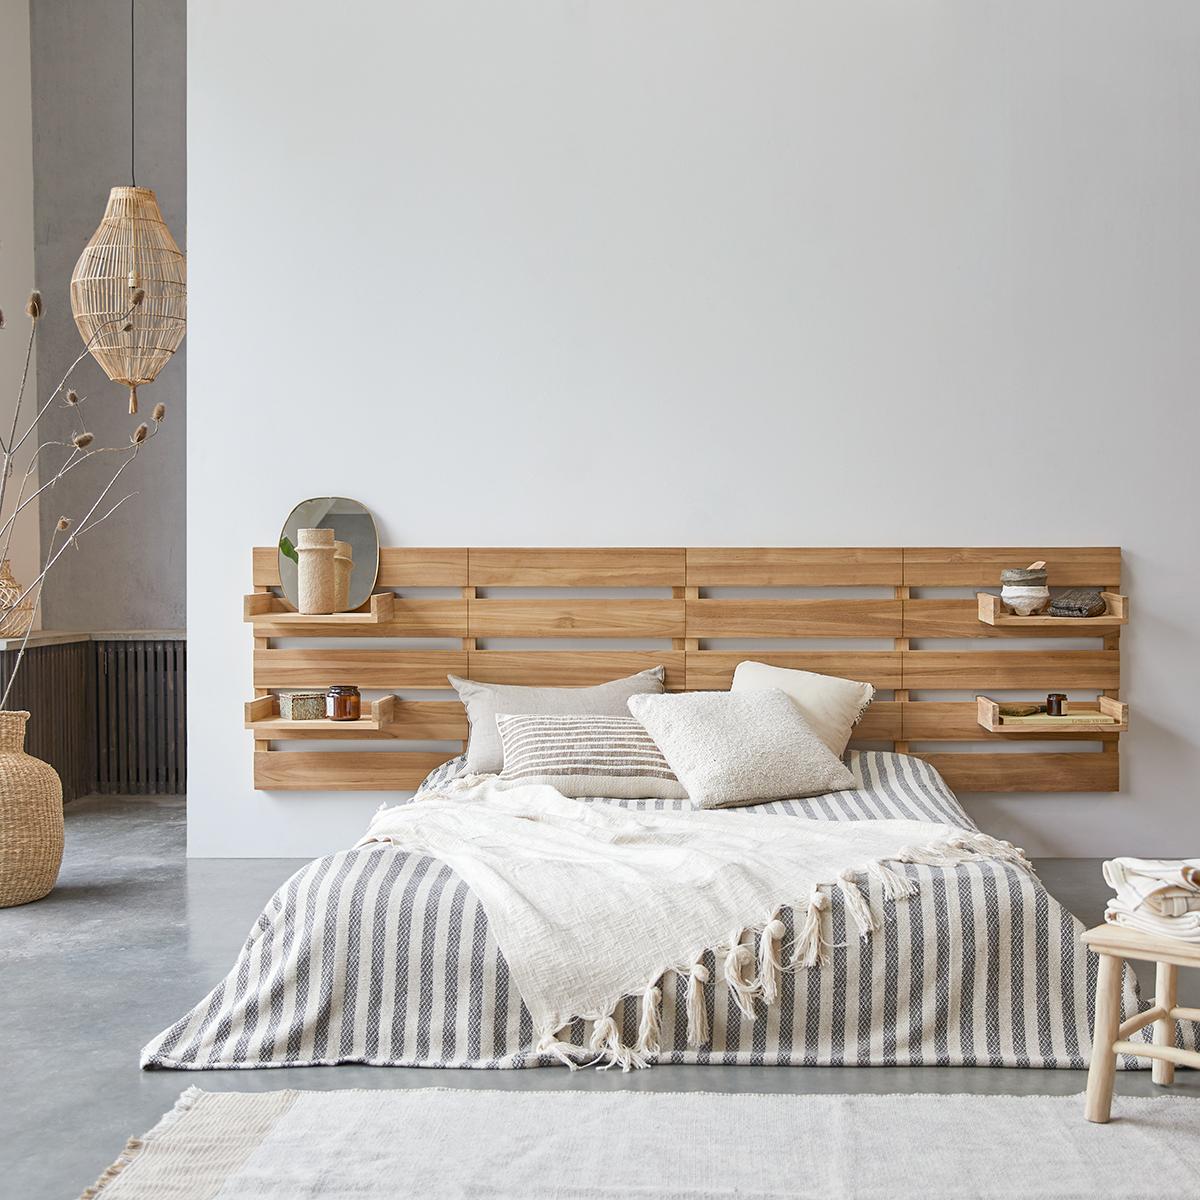 Kopfteil Fur Bett Aus Teak 270 Urbain Betten Kopfteile Tikamoon